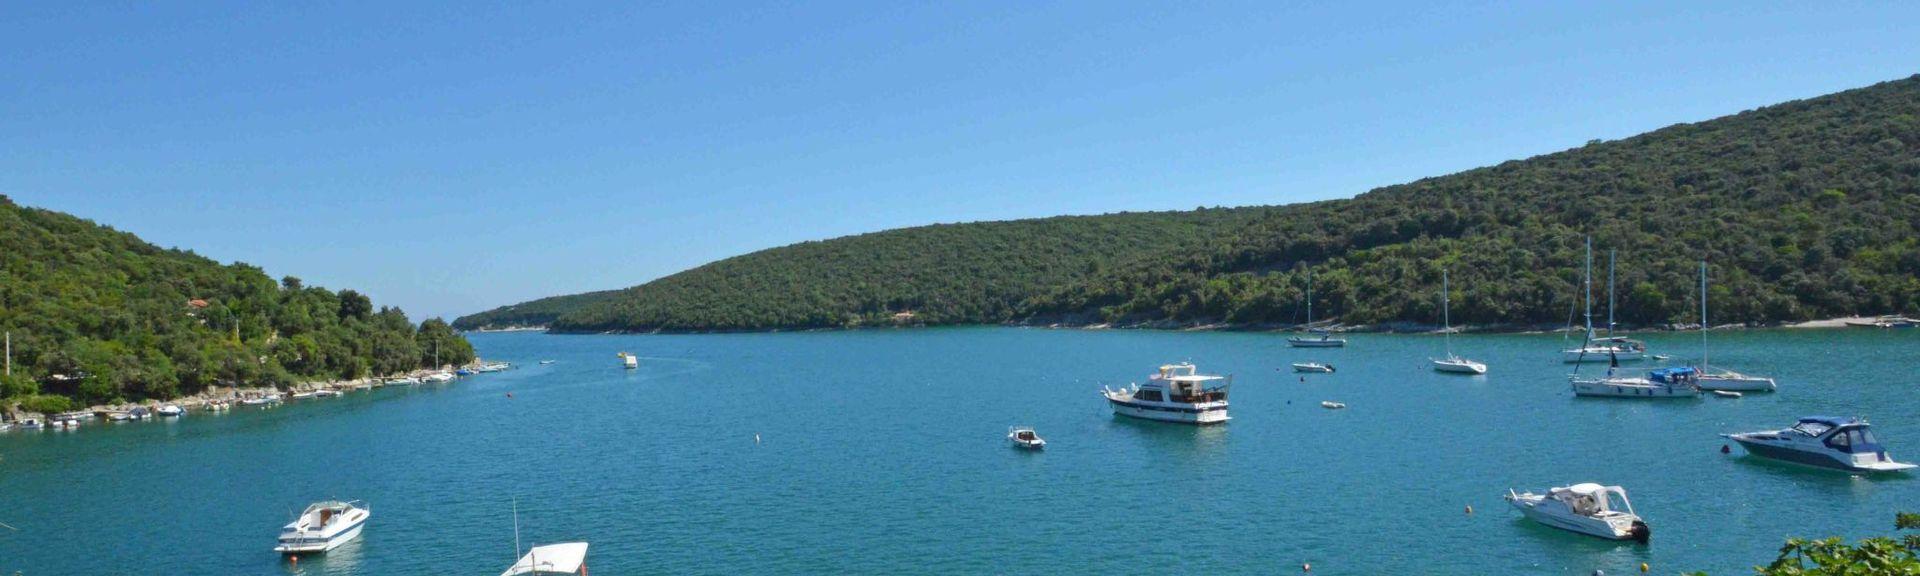 Elafitski-eilanden, Dubrovnik-Neretva, Kroatië